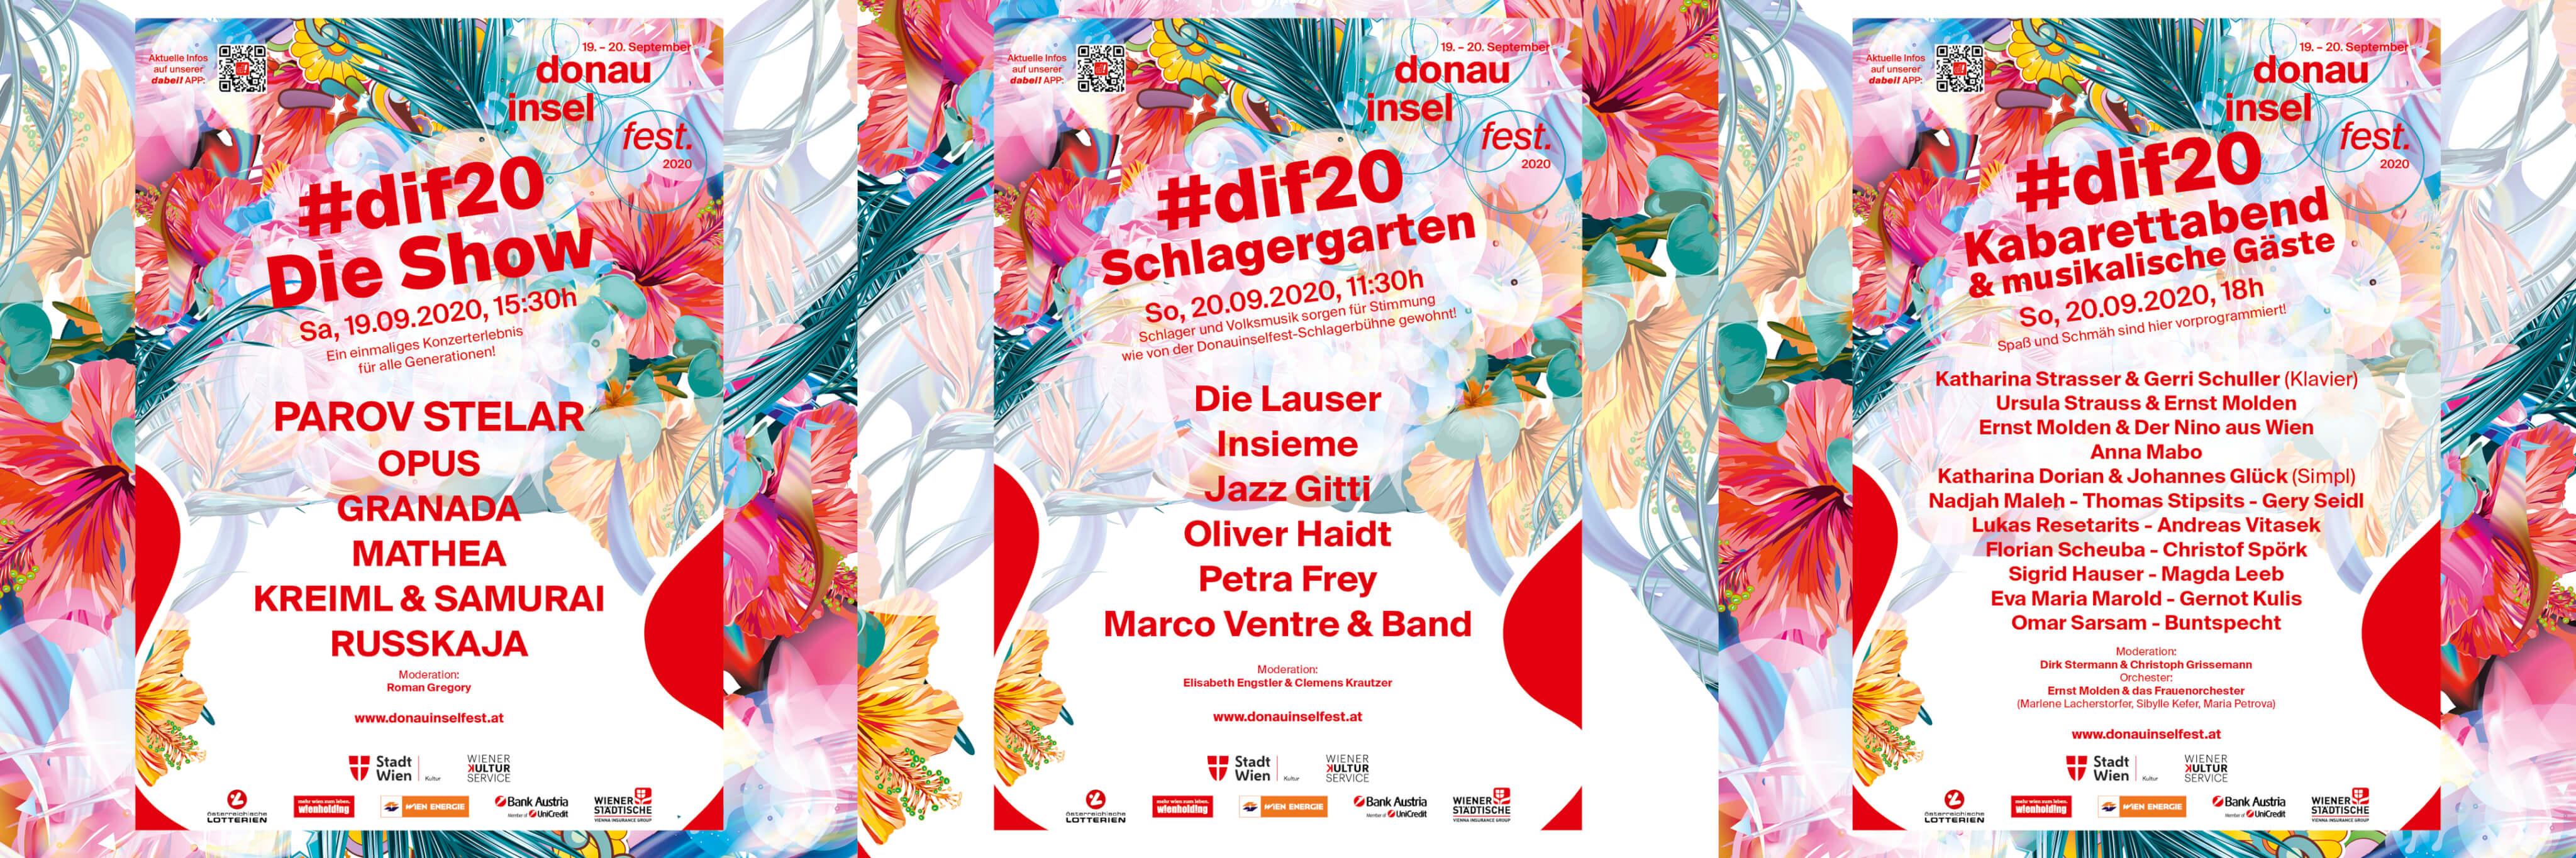 News Donauinselfest 2020 Vom 18 20 September 2020